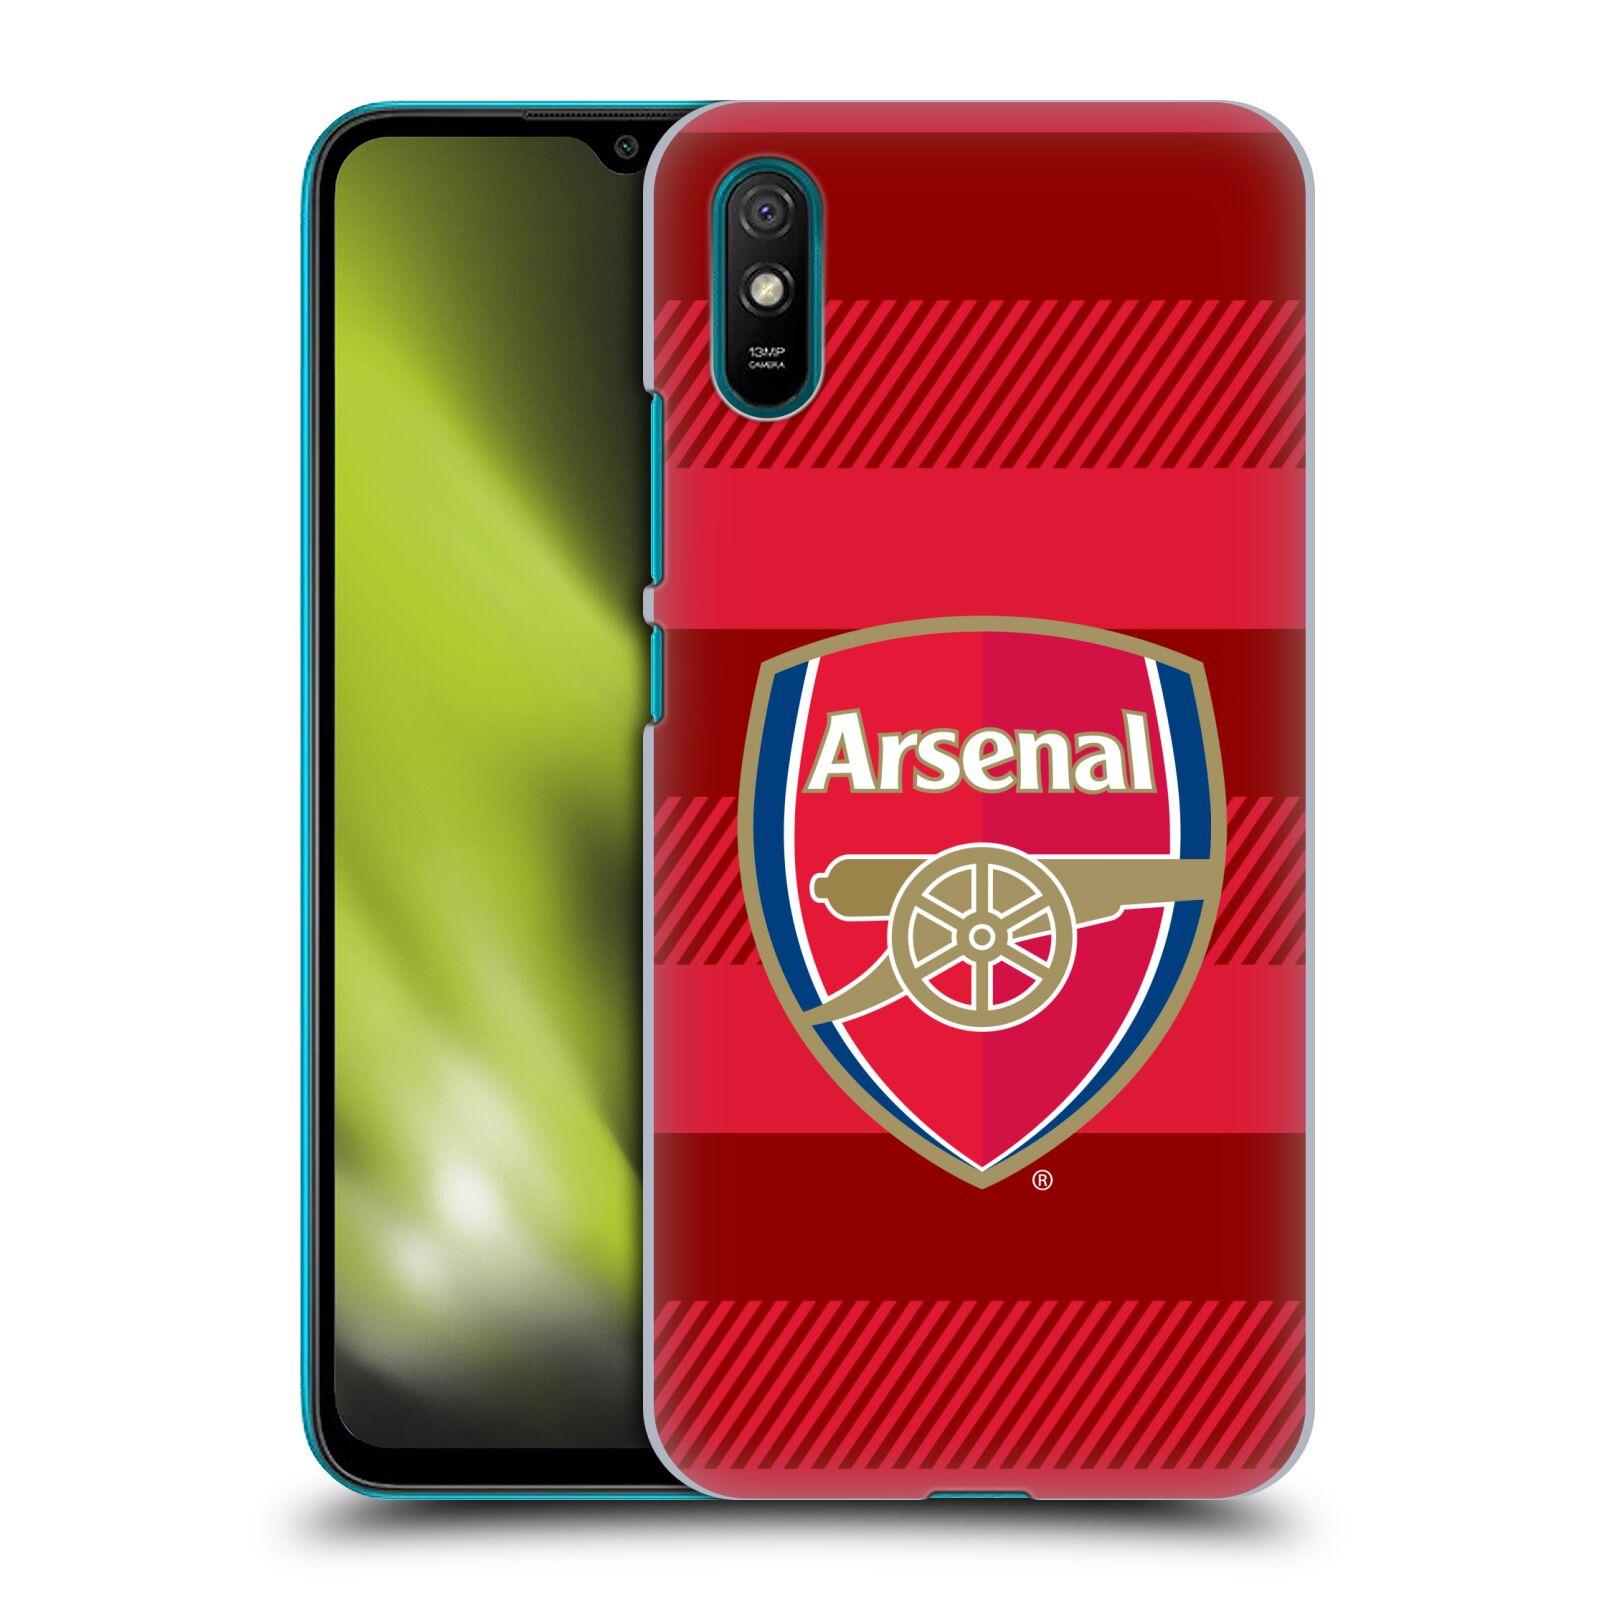 Plastové pouzdro na mobil Xiaomi Redmi 9A / Xiaomi Redmi 9AT - Head Case - Arsenal FC - Logo s pruhy